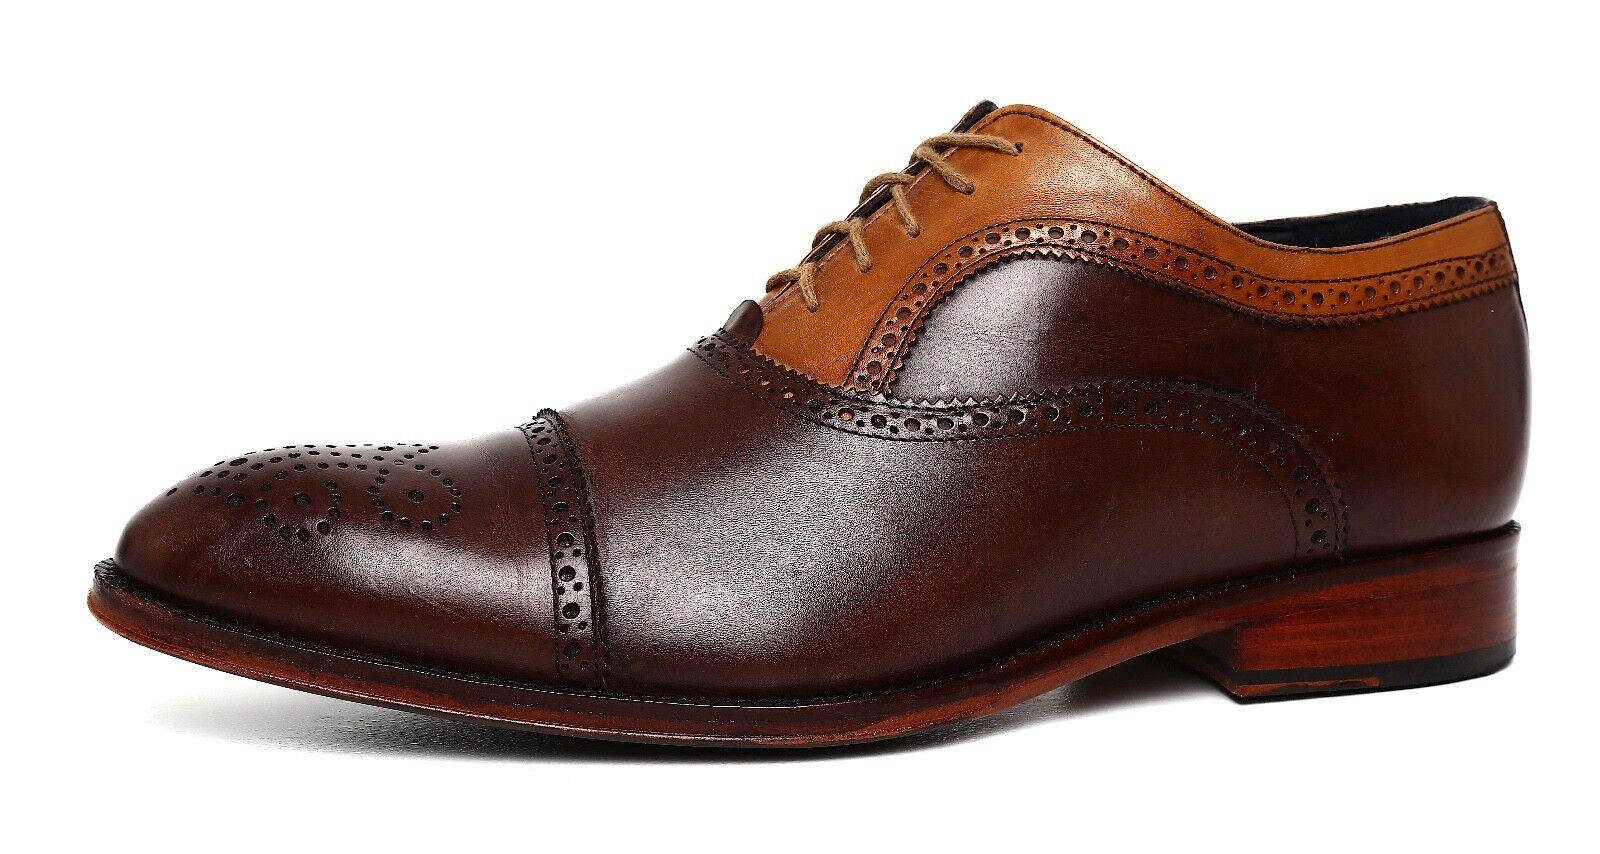 fino al 50% di sconto Messico Antonio Vintage Leather Oxford Marrone Uomo Sz Sz Sz 10 D 5832  bellissimo